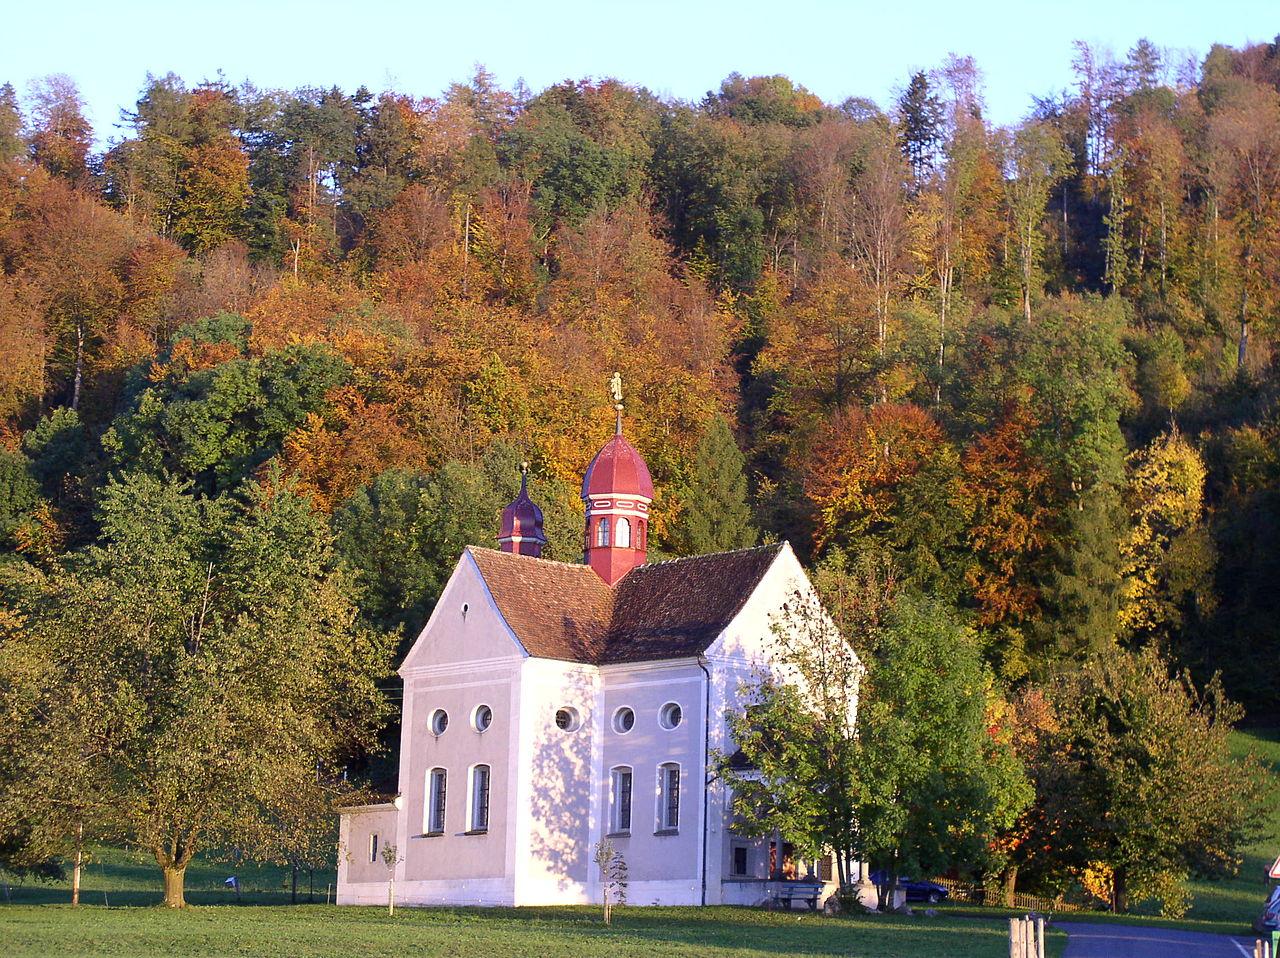 A Szent Verena kápolna Zugban (Svájc)